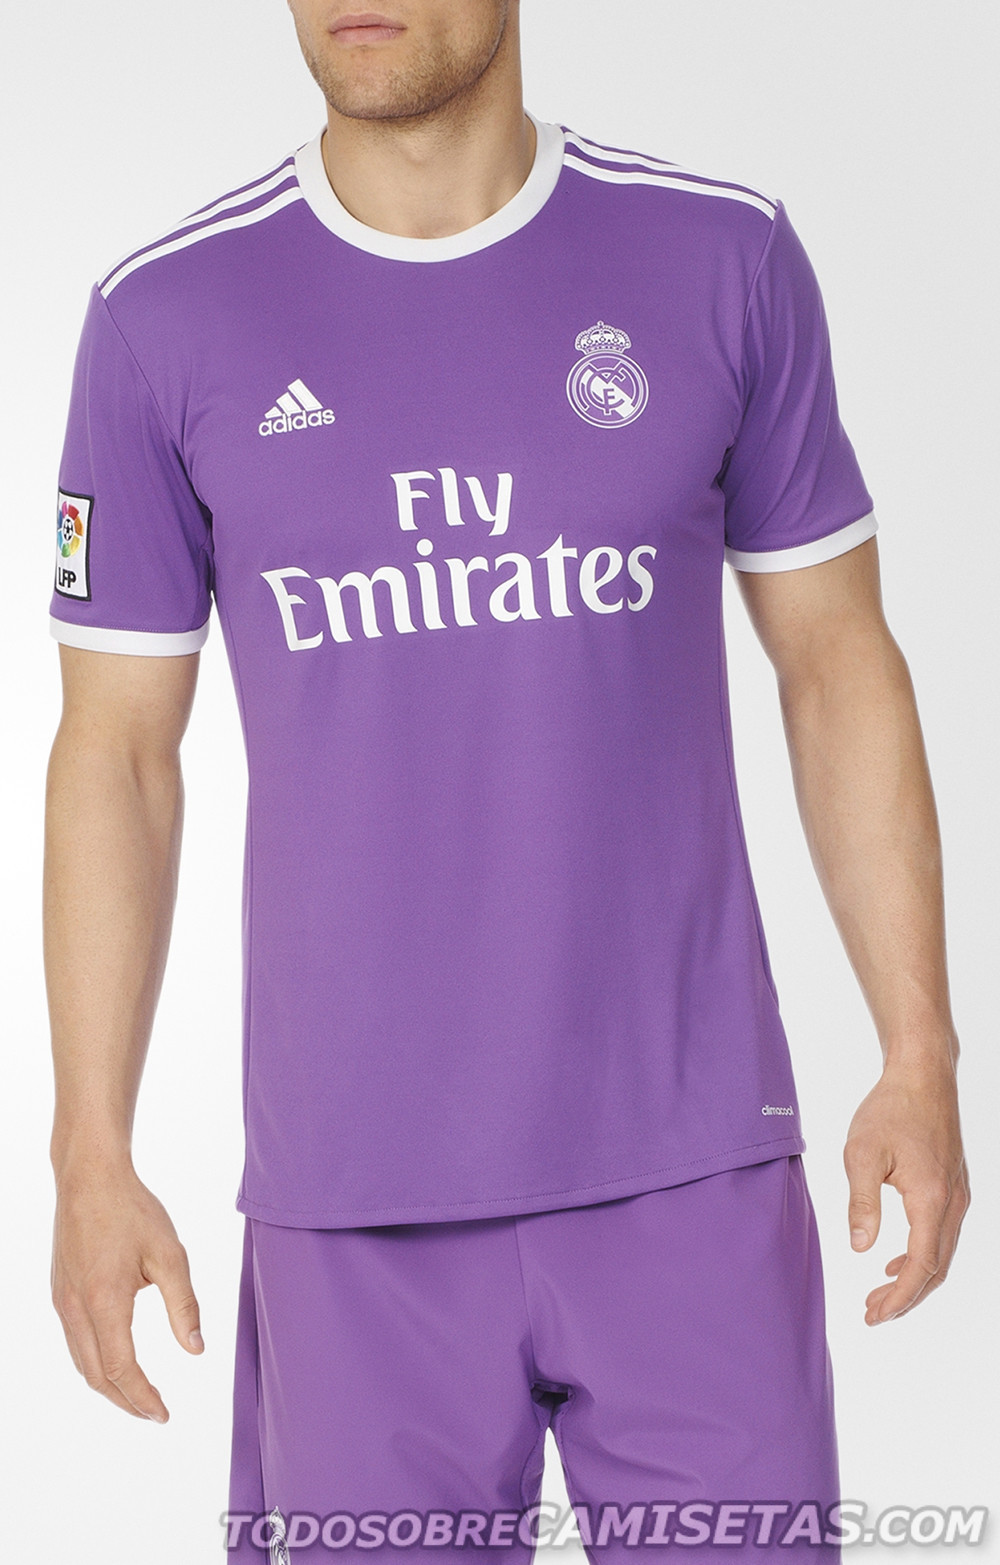 Real-Madrid-2016-17-adidas-new-away-kit-6.jpg